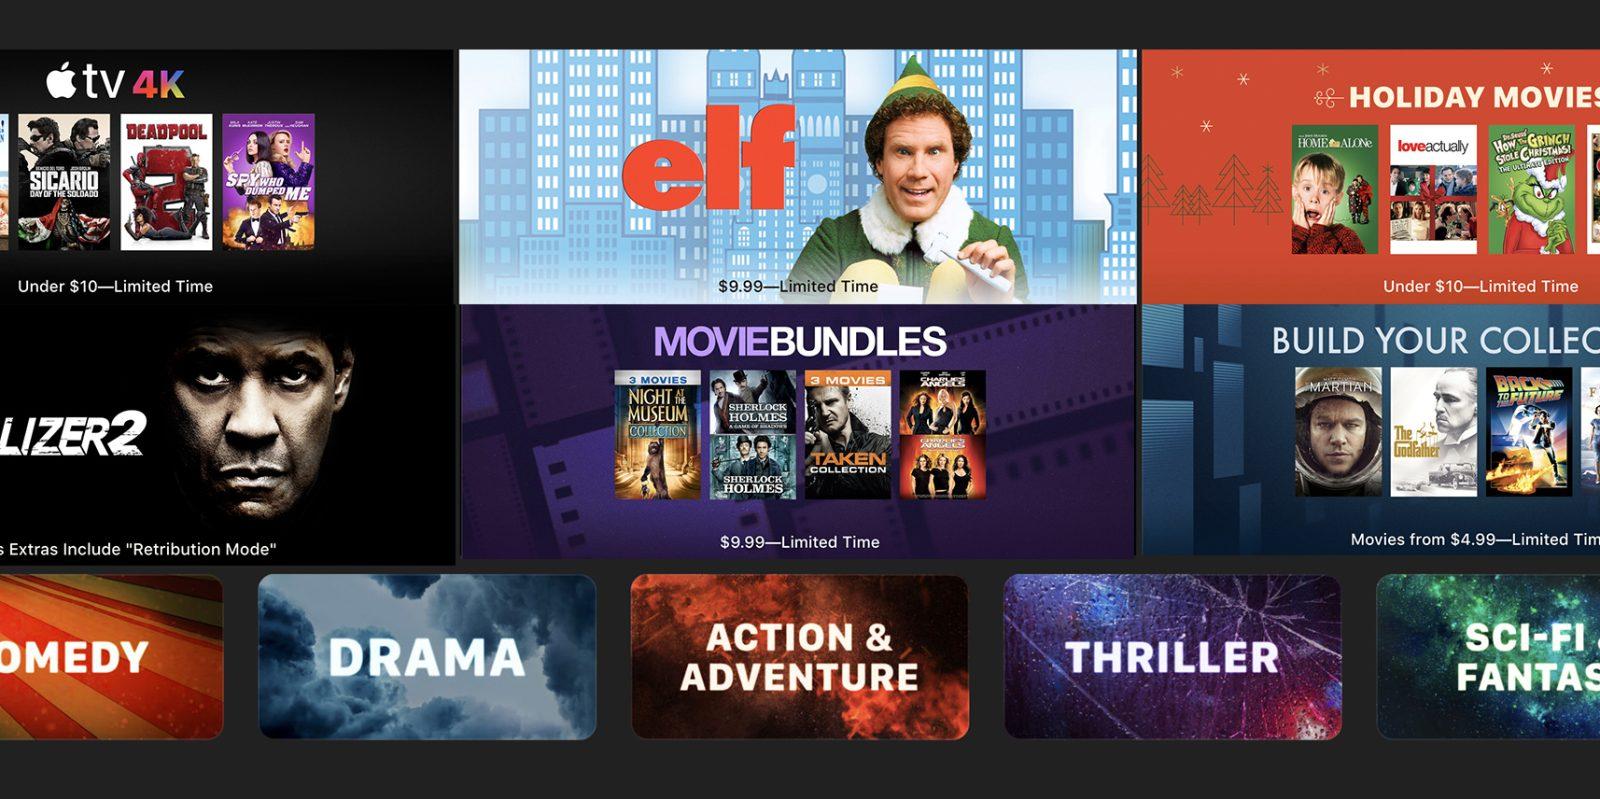 iTunes Black Friday movie sale includes bundles, 4K, more